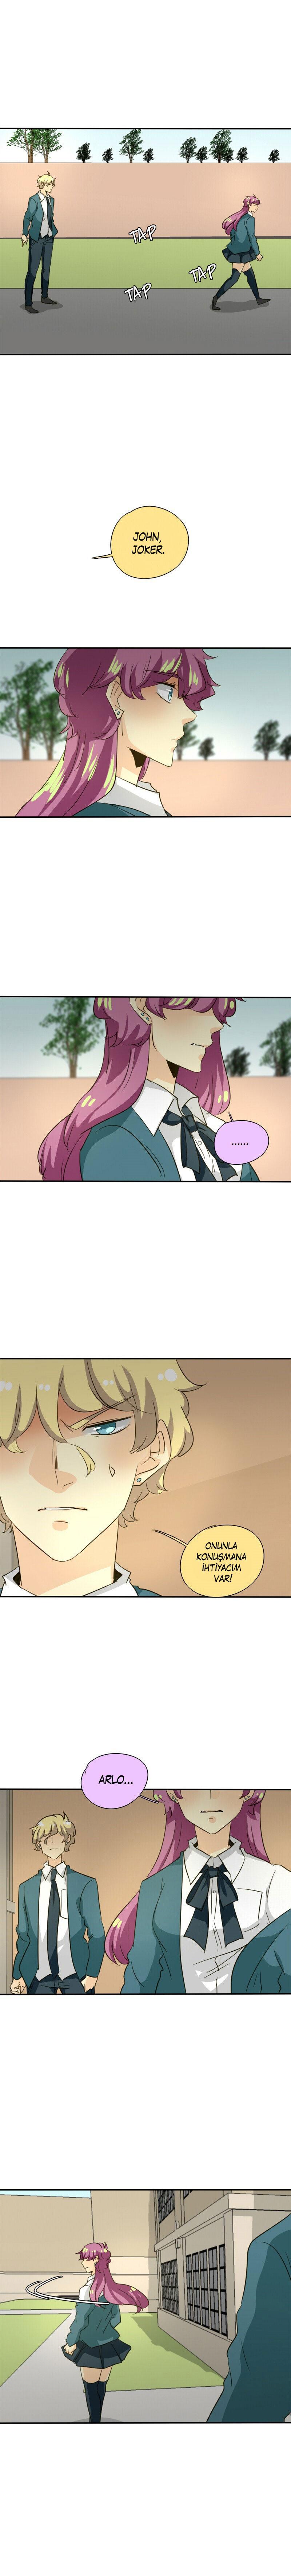 unOrdinary Bölüm 148 - Sayfa 1 - Mavi Manga